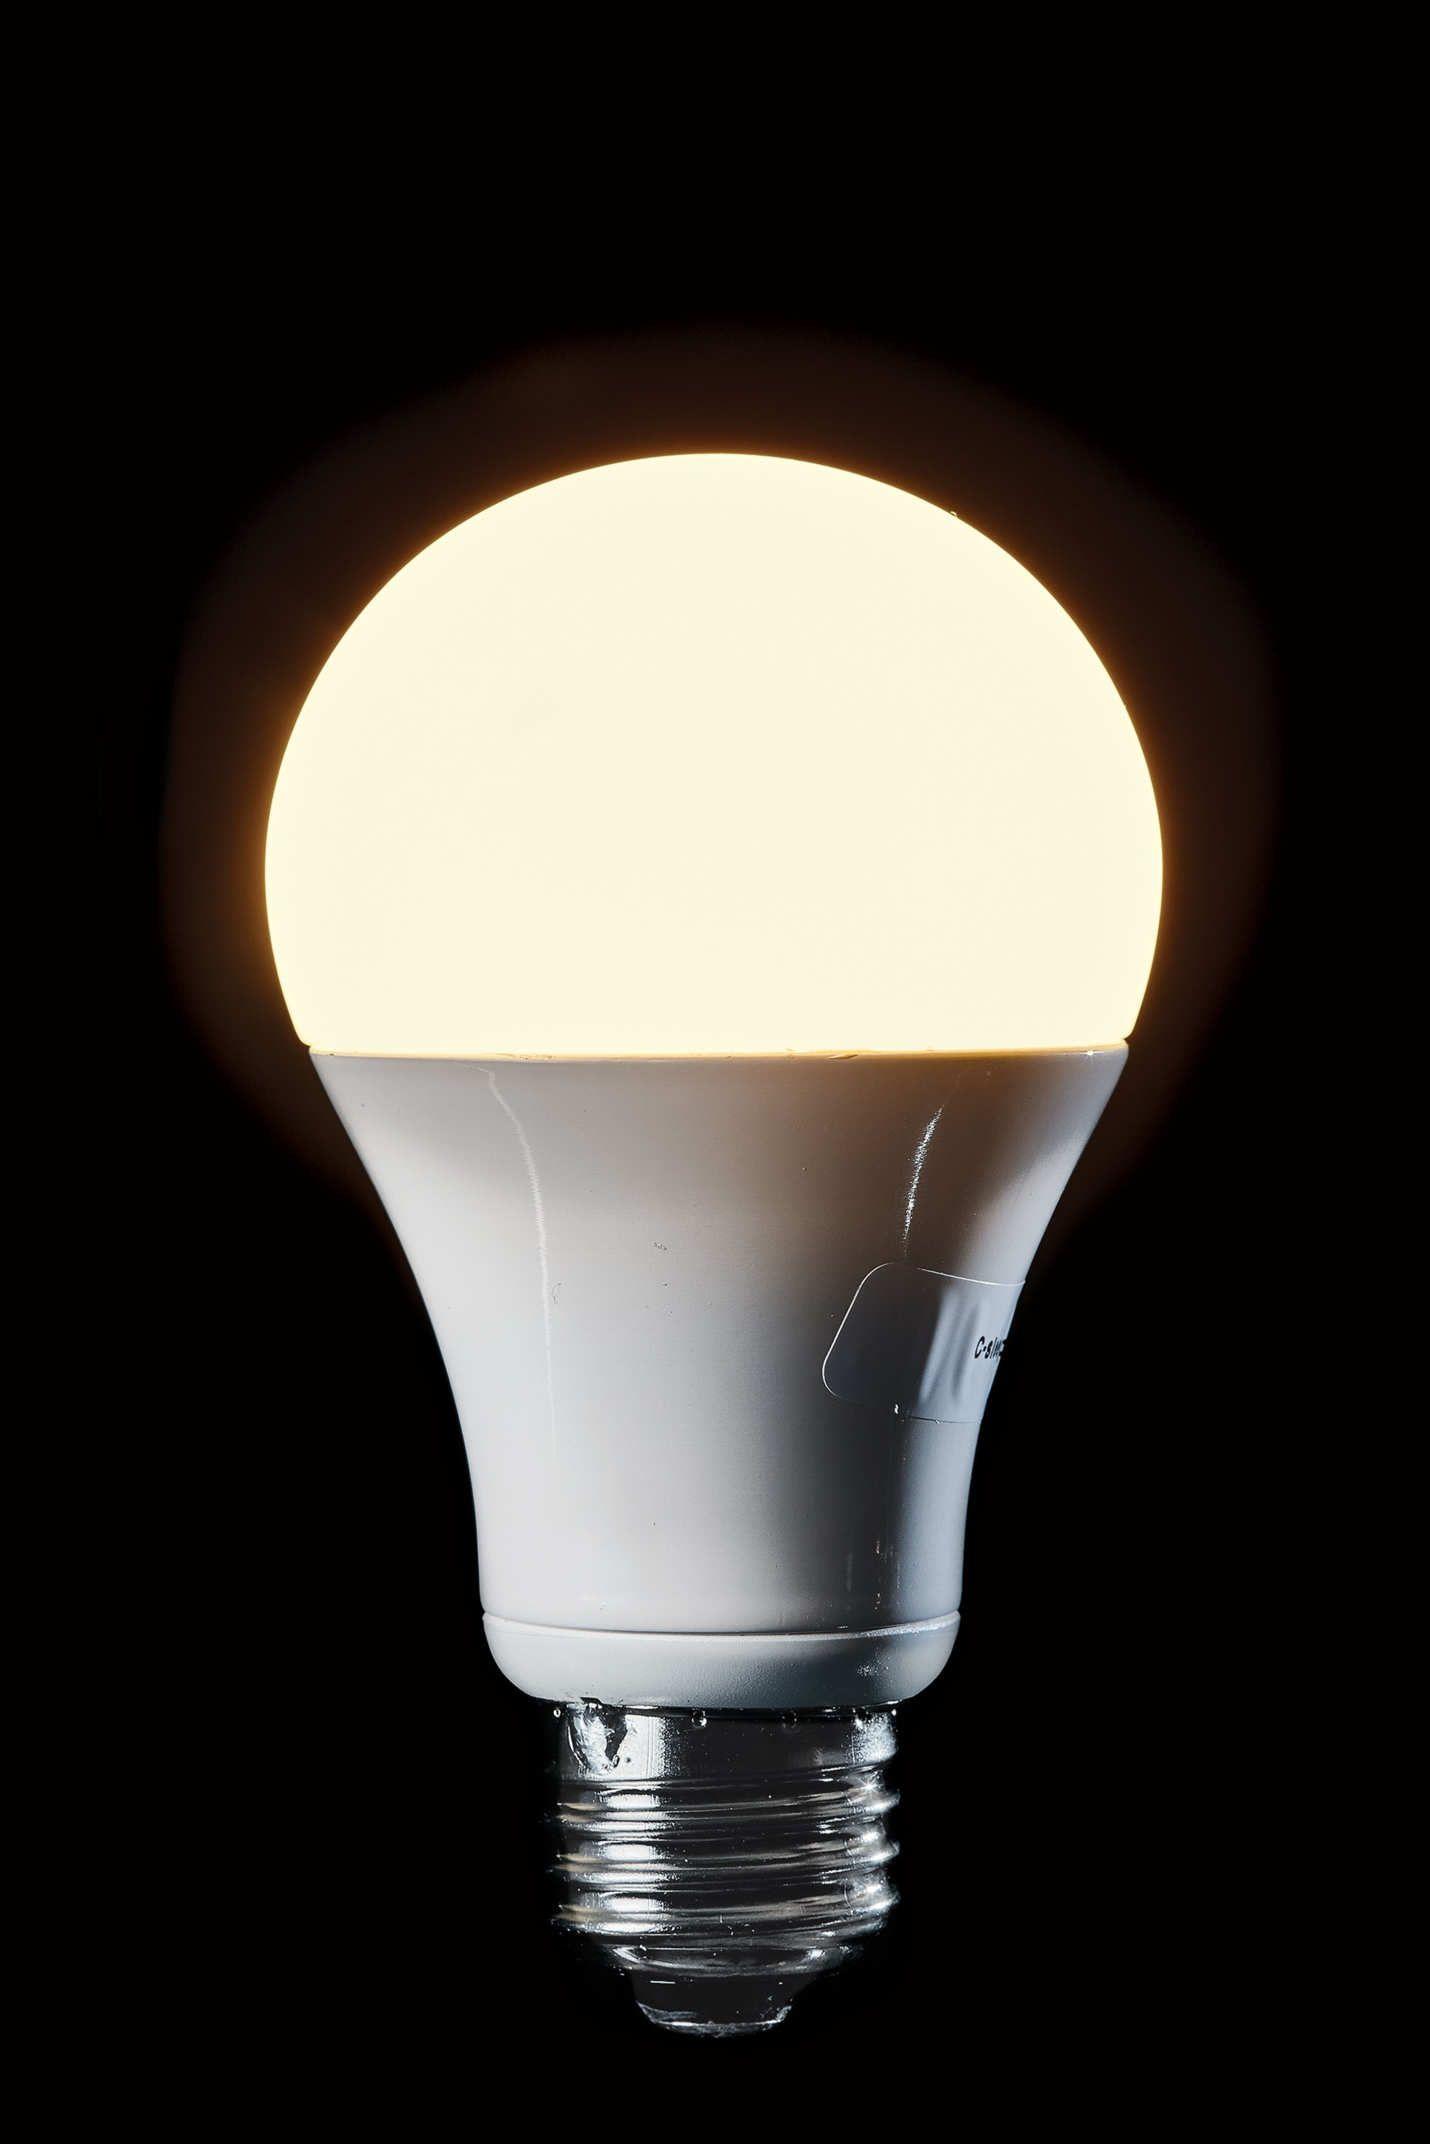 27 Mood Lights To Keep You Happy Relaxed Or Focused Blue Light Bulb Led Light Bulb Bulb